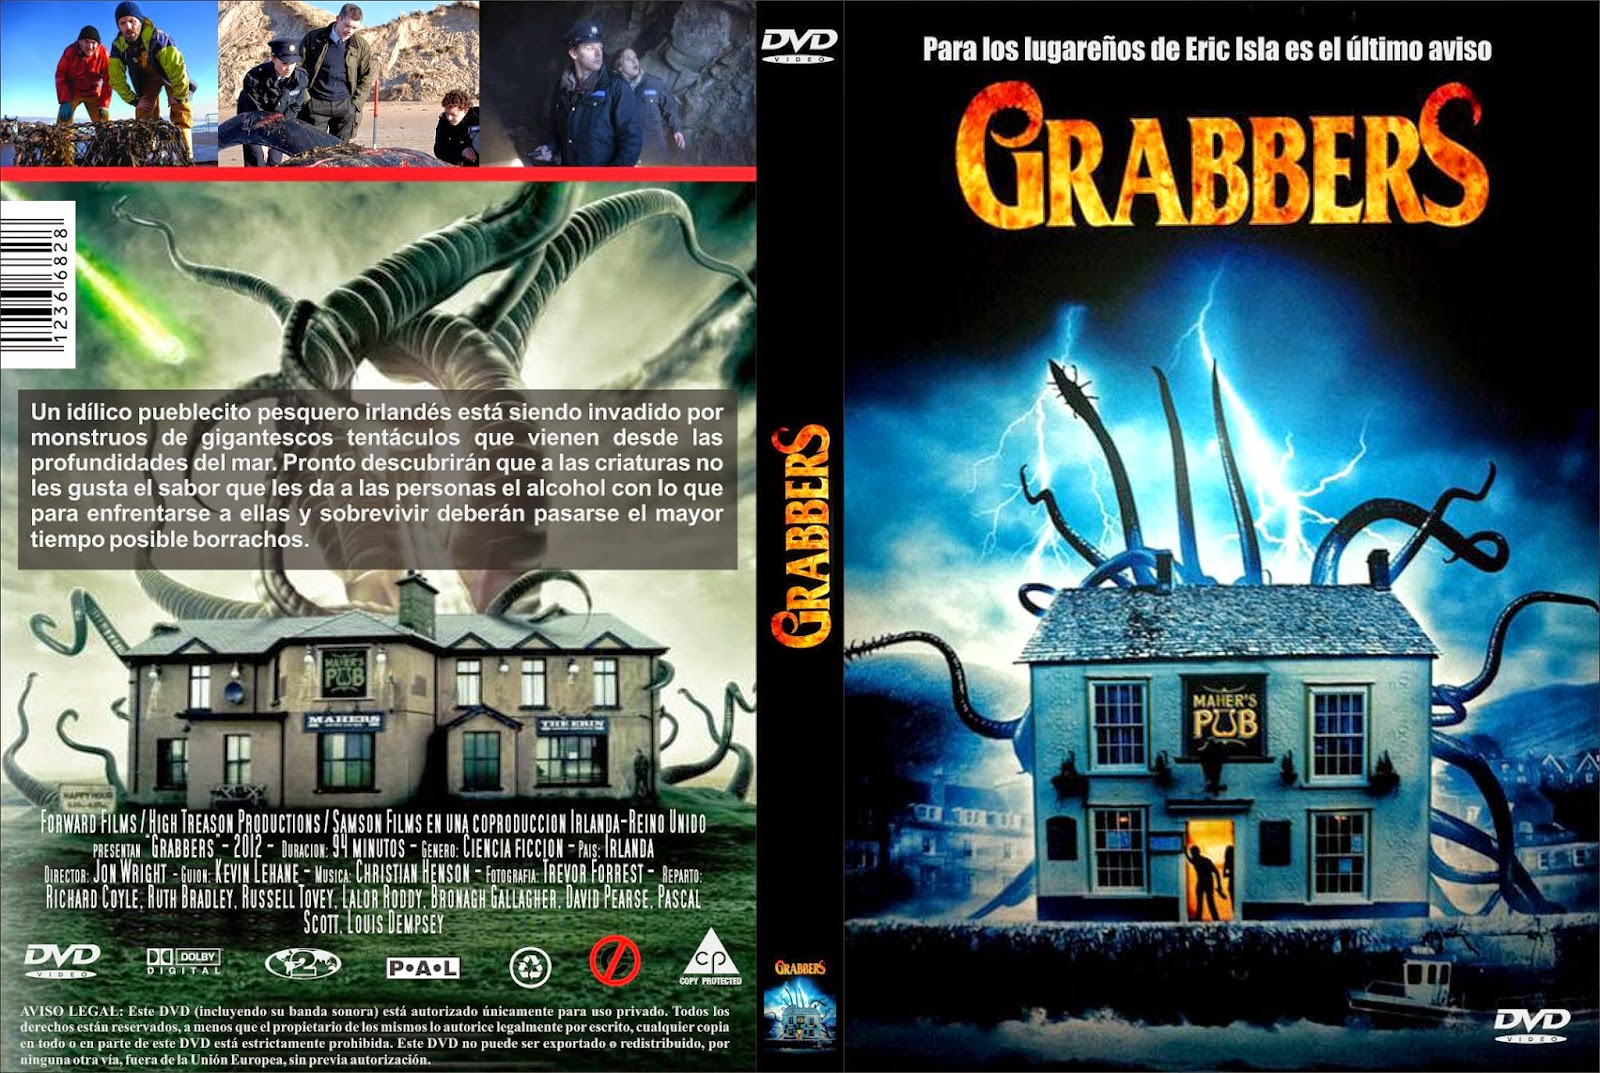 Grabbers DVD